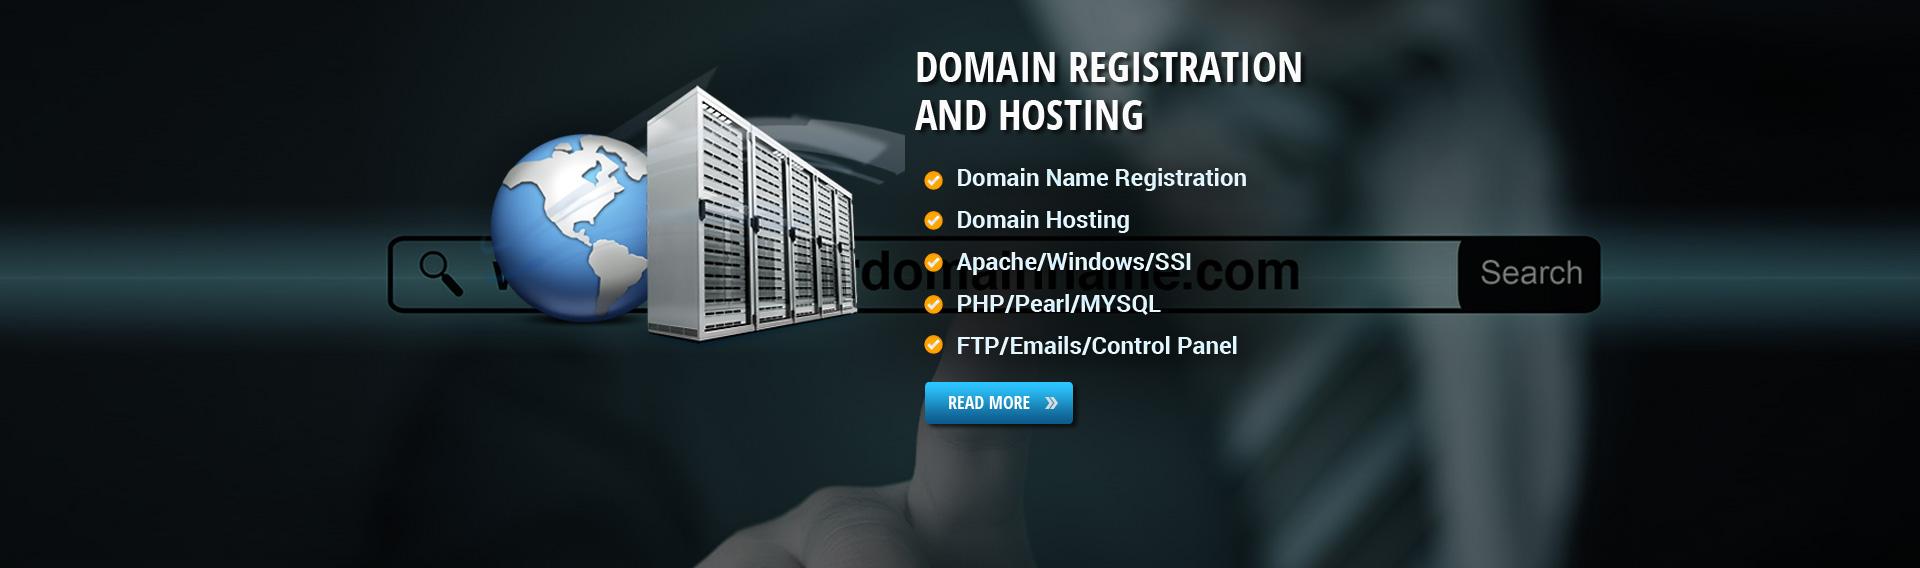 DomainHosting